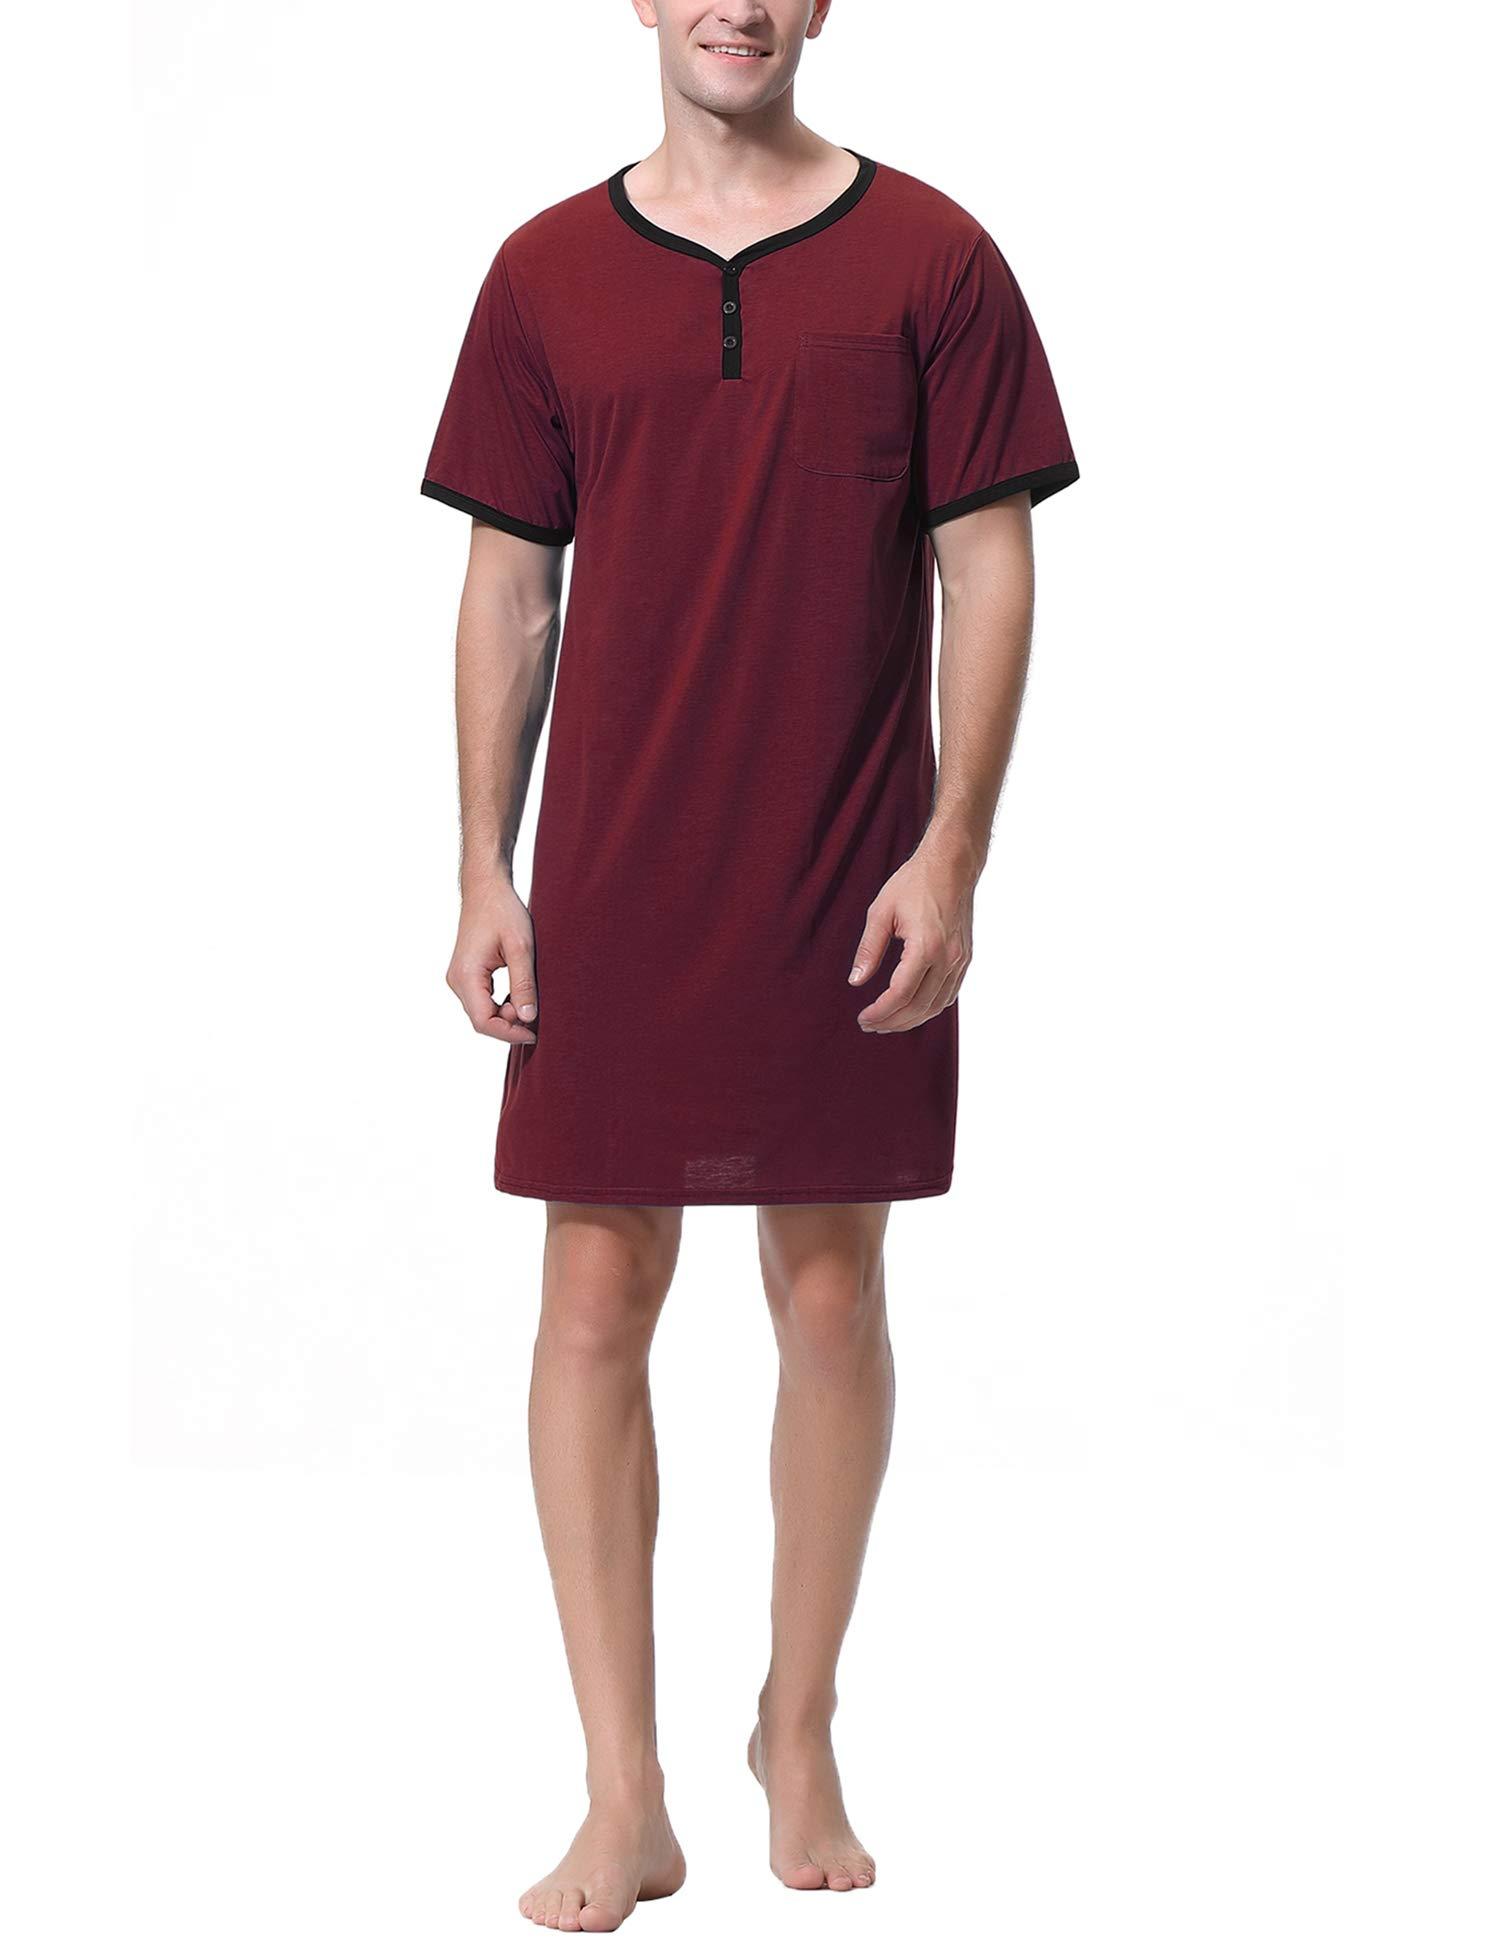 Mens Nightshirts Short Sleeve Nightgown Pajamas Nightwear Lightweight Sleepwear for Summer Home Hospital M-XXXL